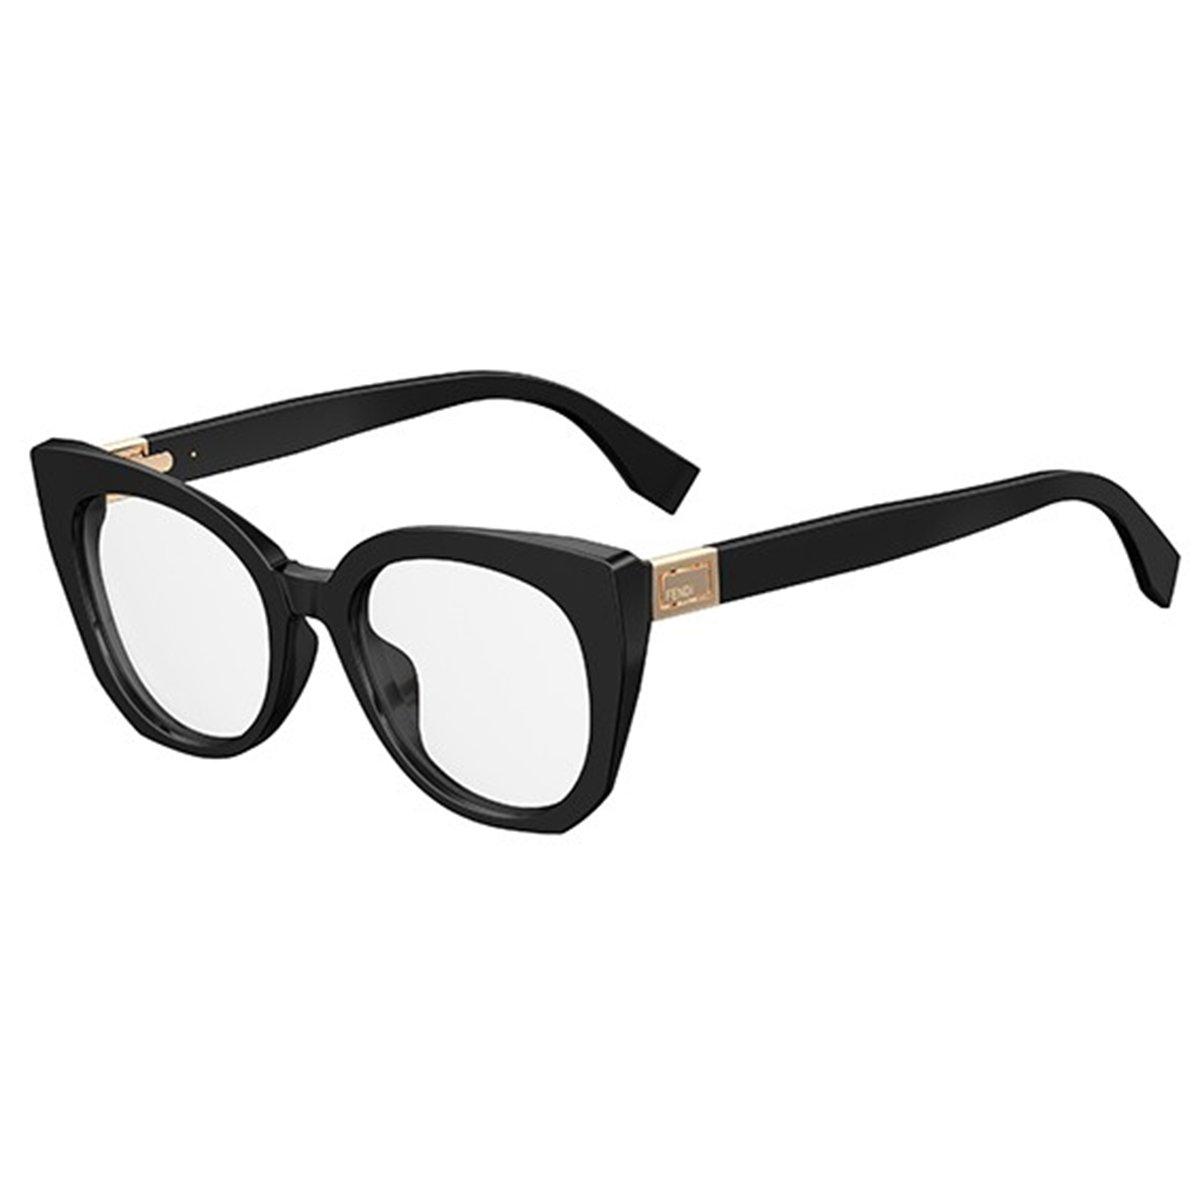 Compre Óculos de Grau Fendi Peekaboo em 10X   Tri-Jóia Shop c25e8d3d4d